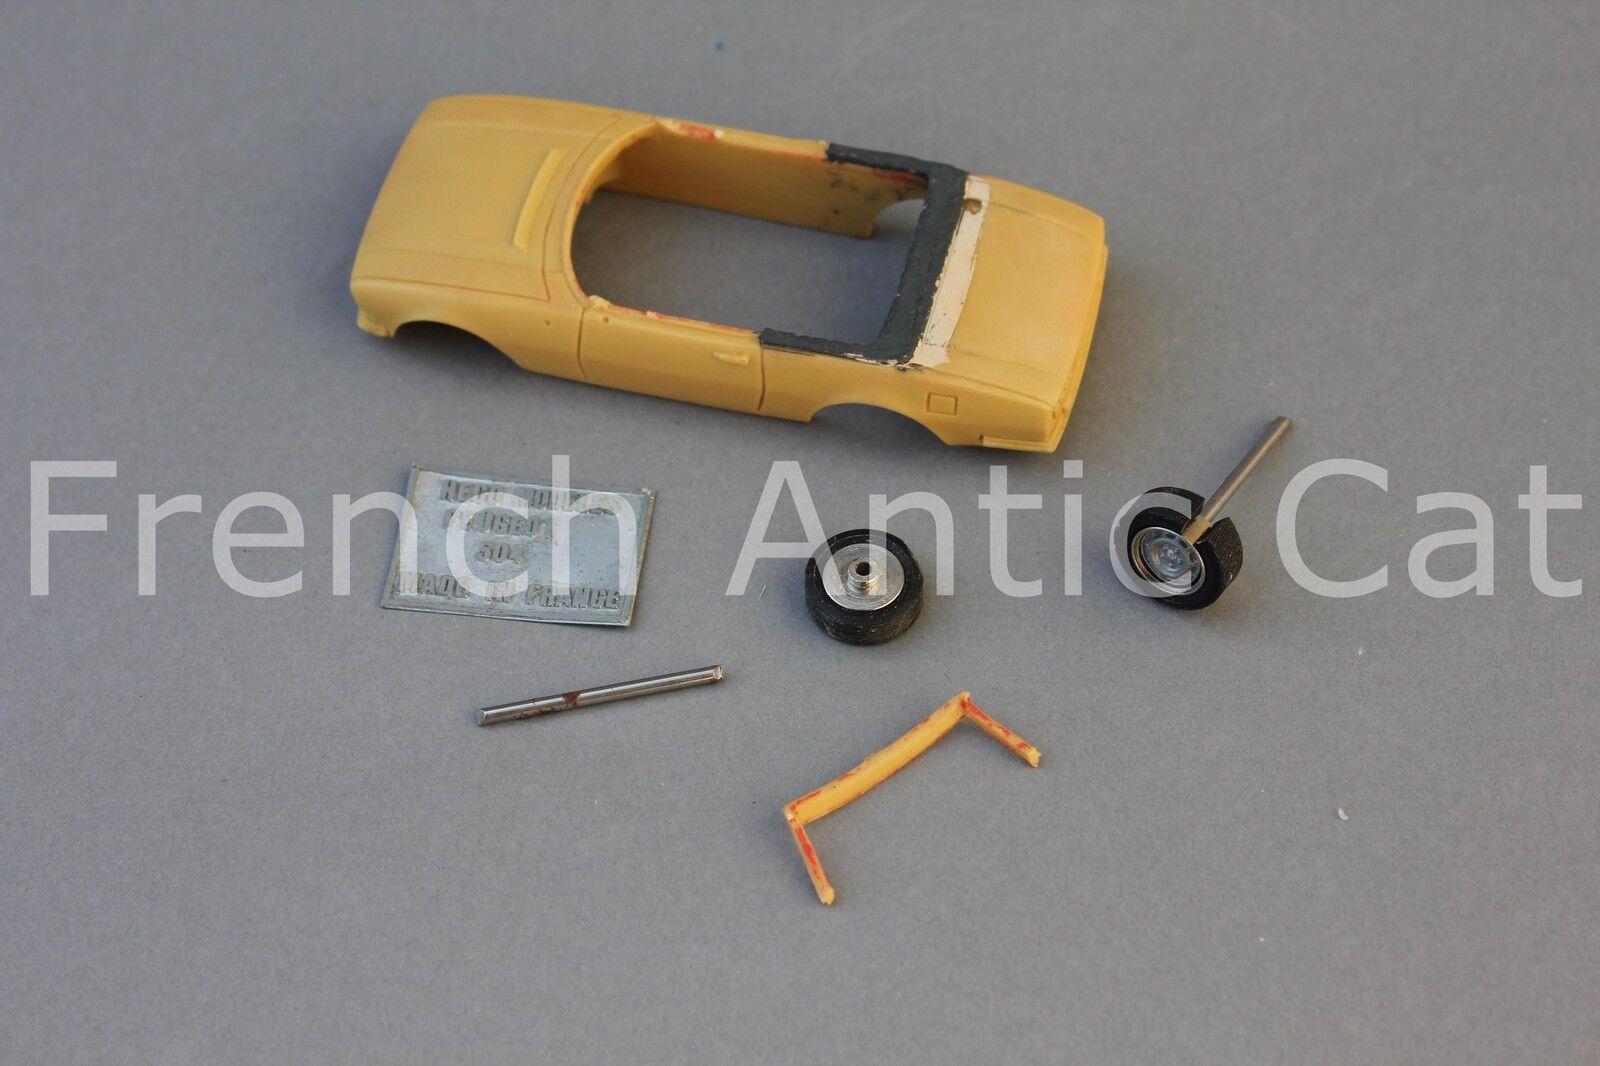 Rare modele résine prossootype PEUGEOT 504 1 43 Heco modeles véhicule FE'